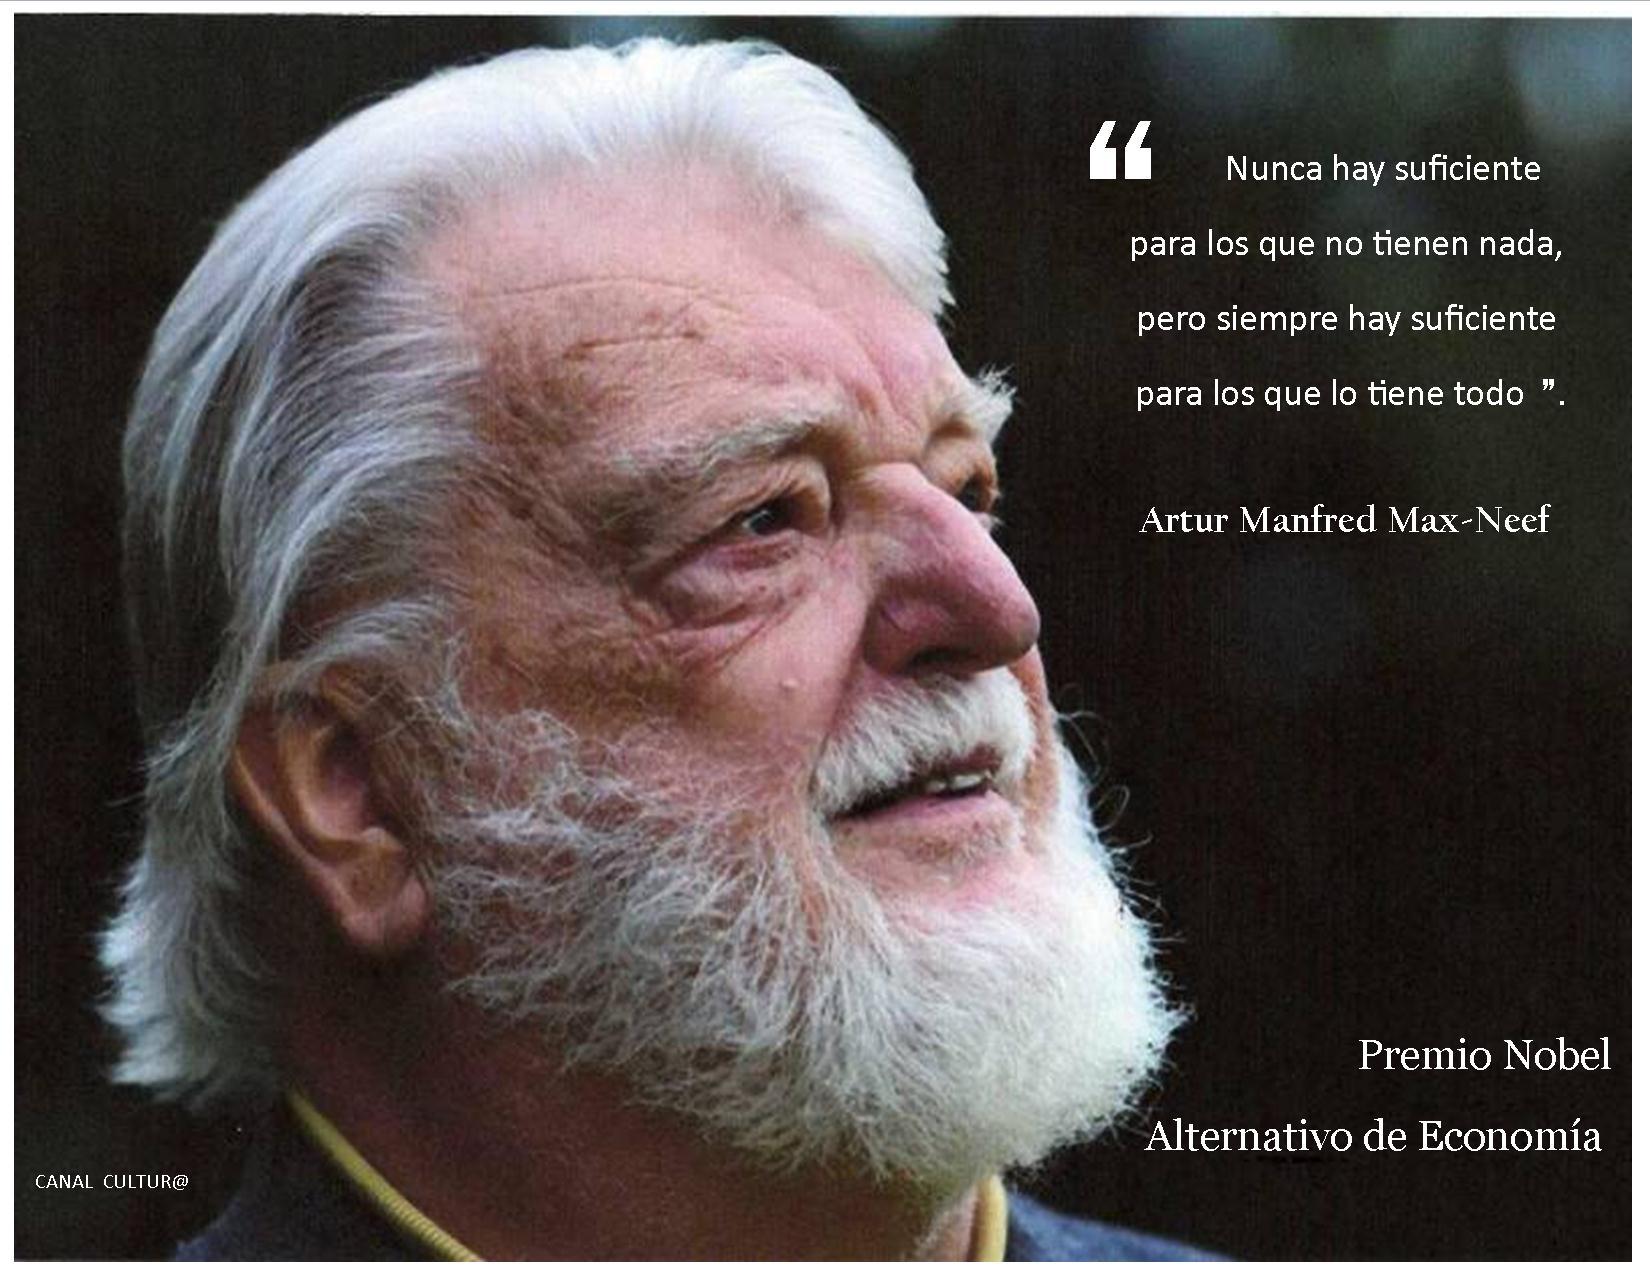 http://carloscastrom.files.wordpress.com/2012/07/artur-manfred-max-neef-nobel-aternativo-economia-frases1.jpg